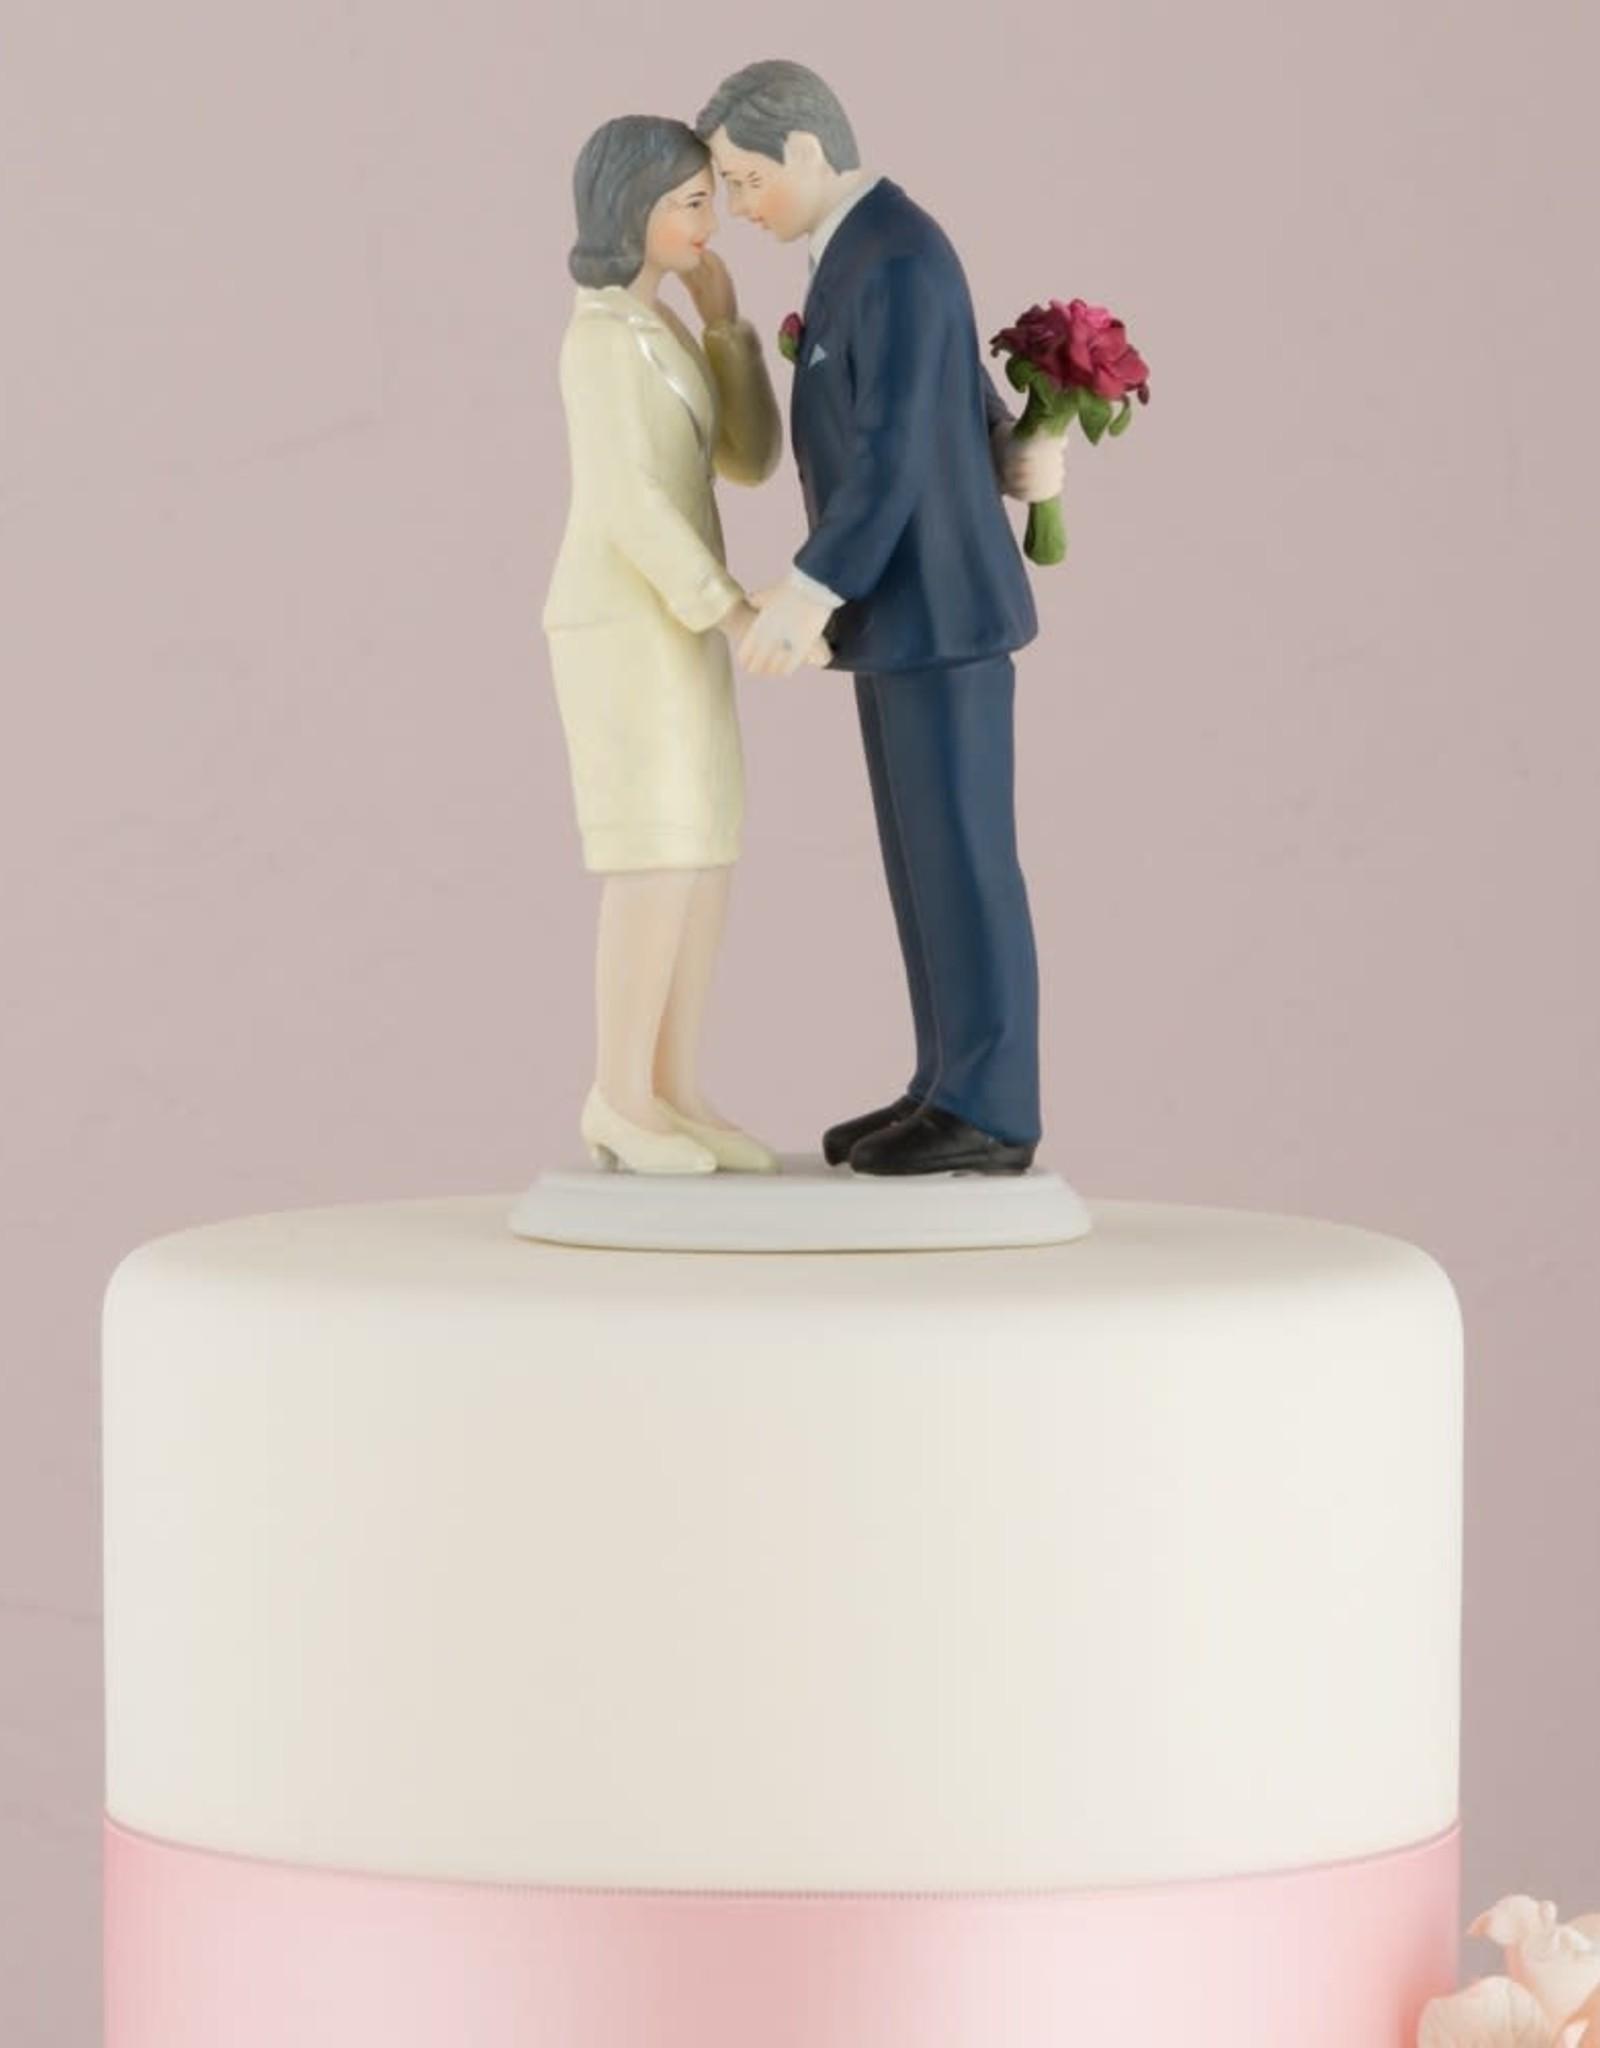 Mature Couple Cake Topper